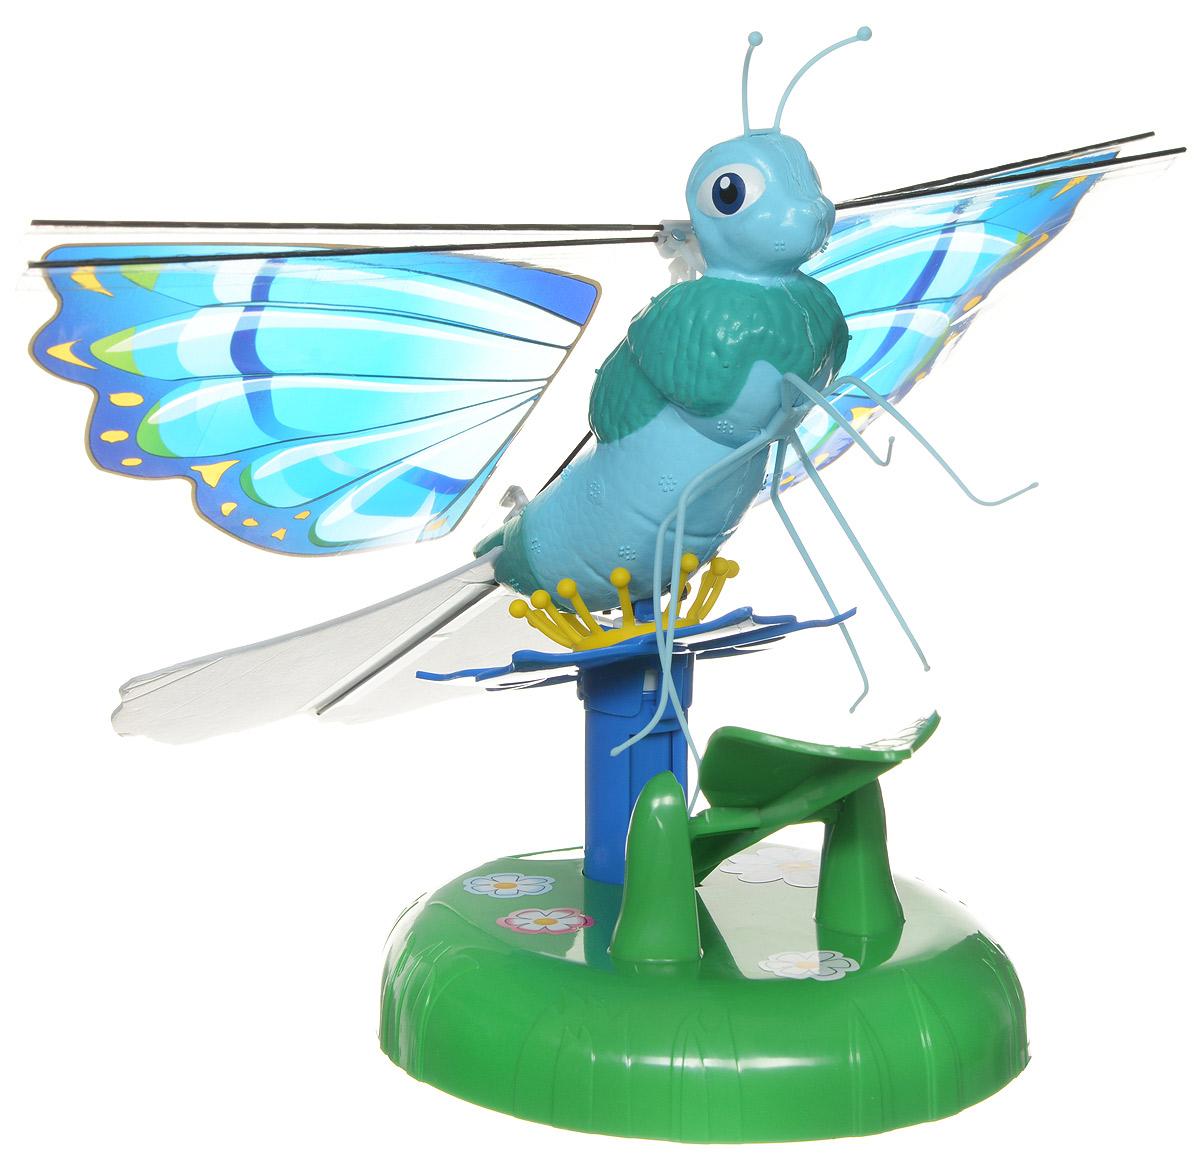 Splash Toys Интерактивная игрушка Летающая бабочка Zinnia купить гоша интерактивная игрушка